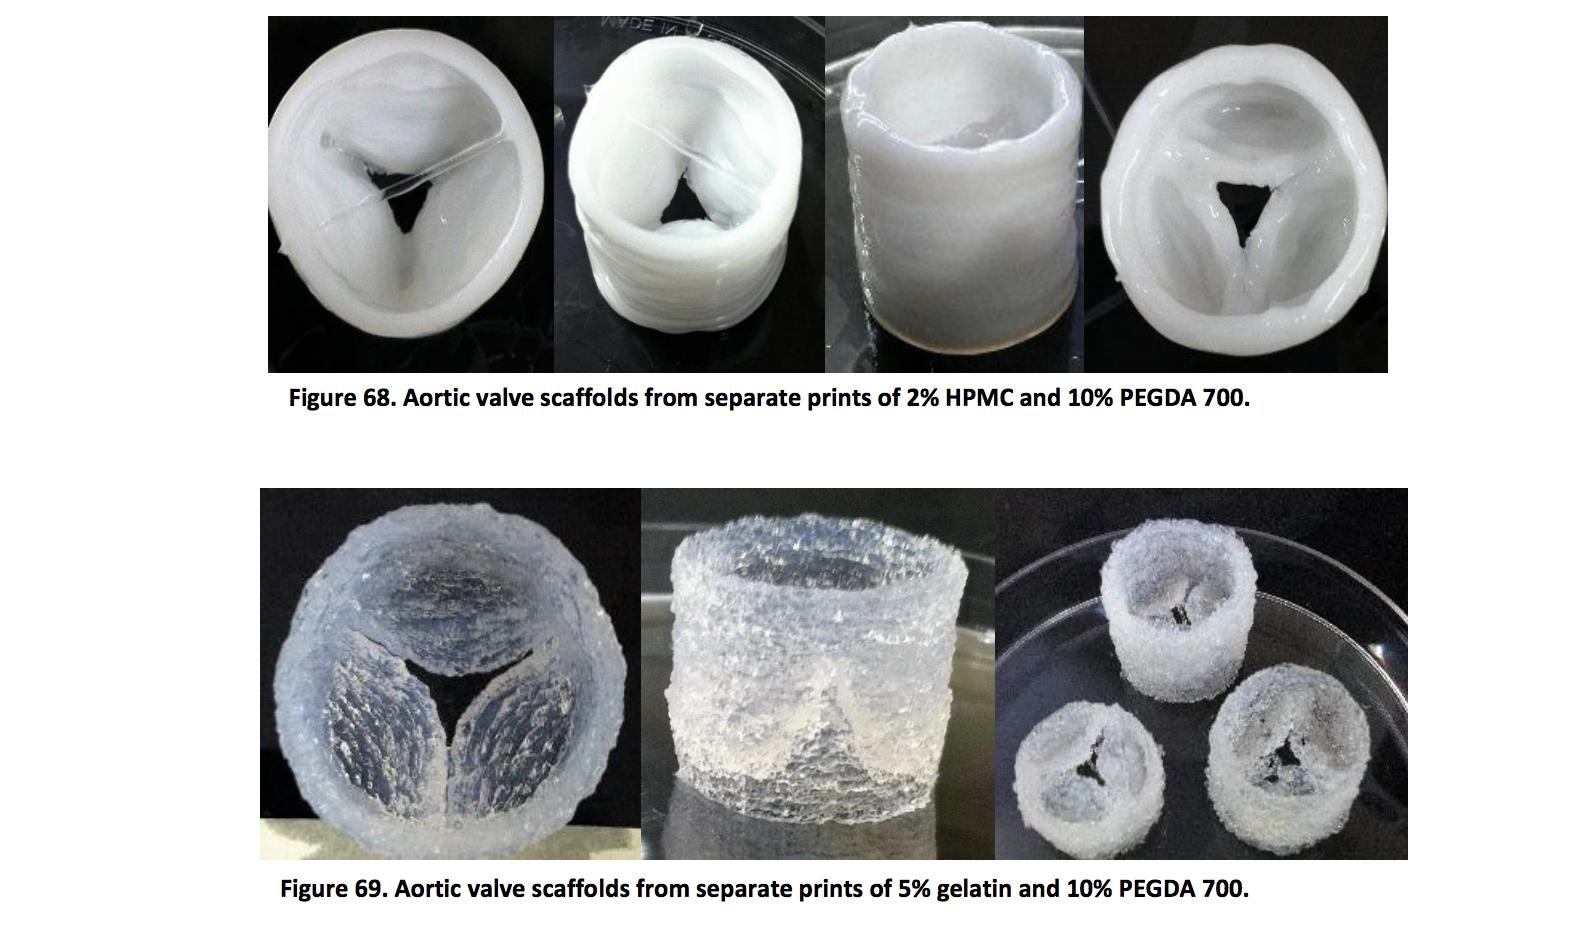 Allevi bioprinter bioprint aortic and cardiac scaffolds